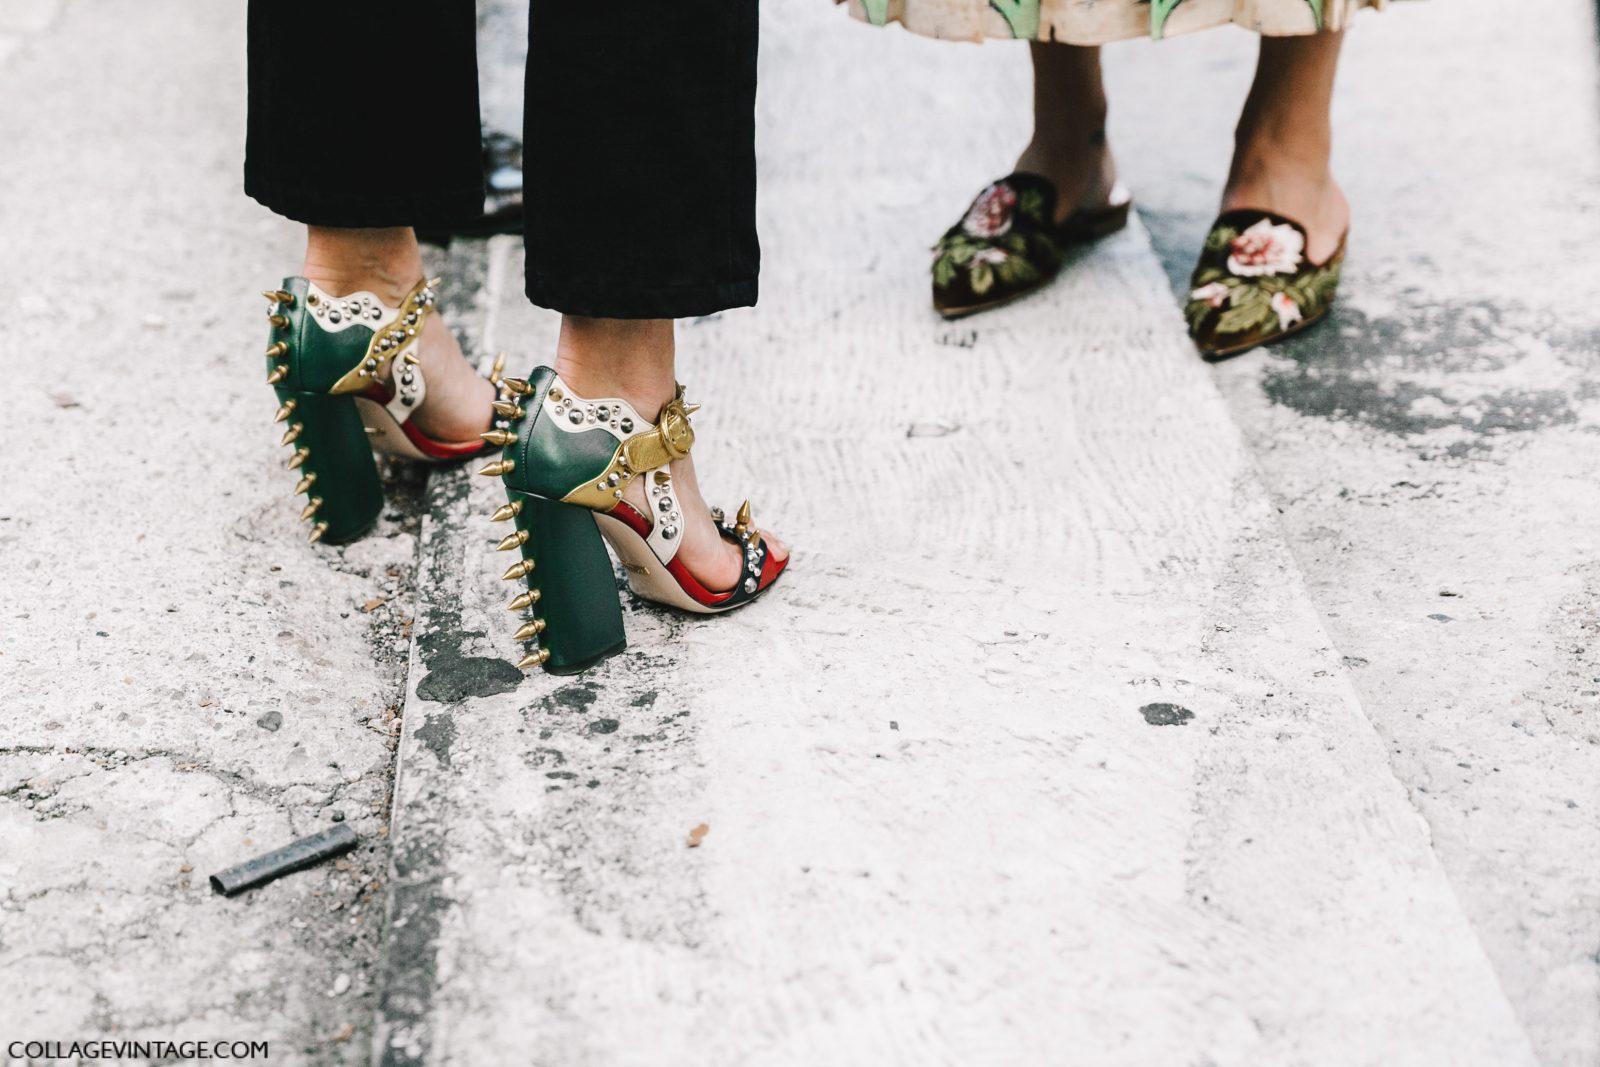 mfw-milan_fashion_week_ss17-street_style-outfits-collage_vintage-gucci-numero_21-alberta_ferreti-15